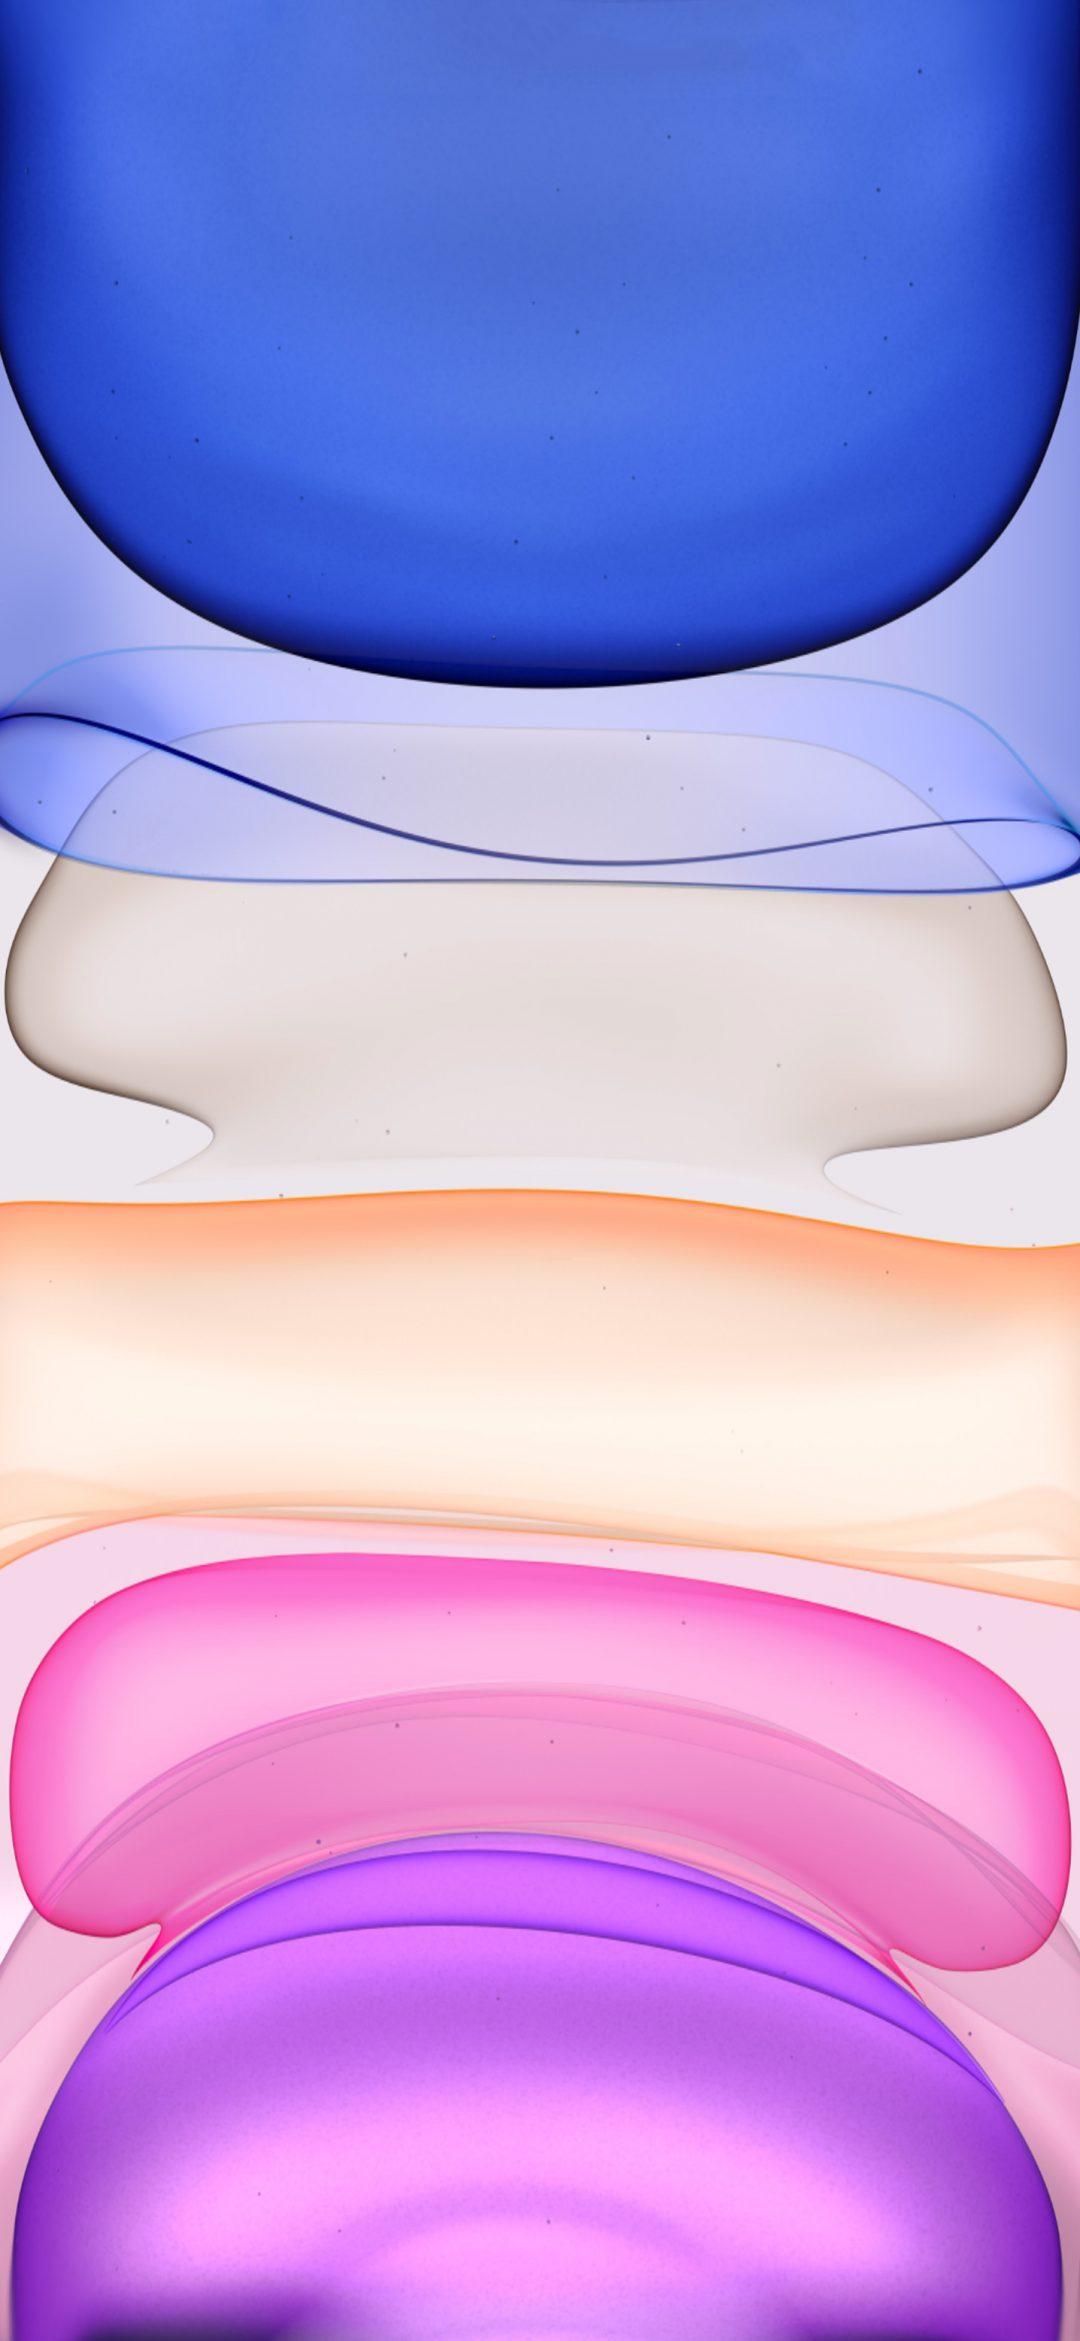 Iphone 11 Pro Max - HD Wallpaper